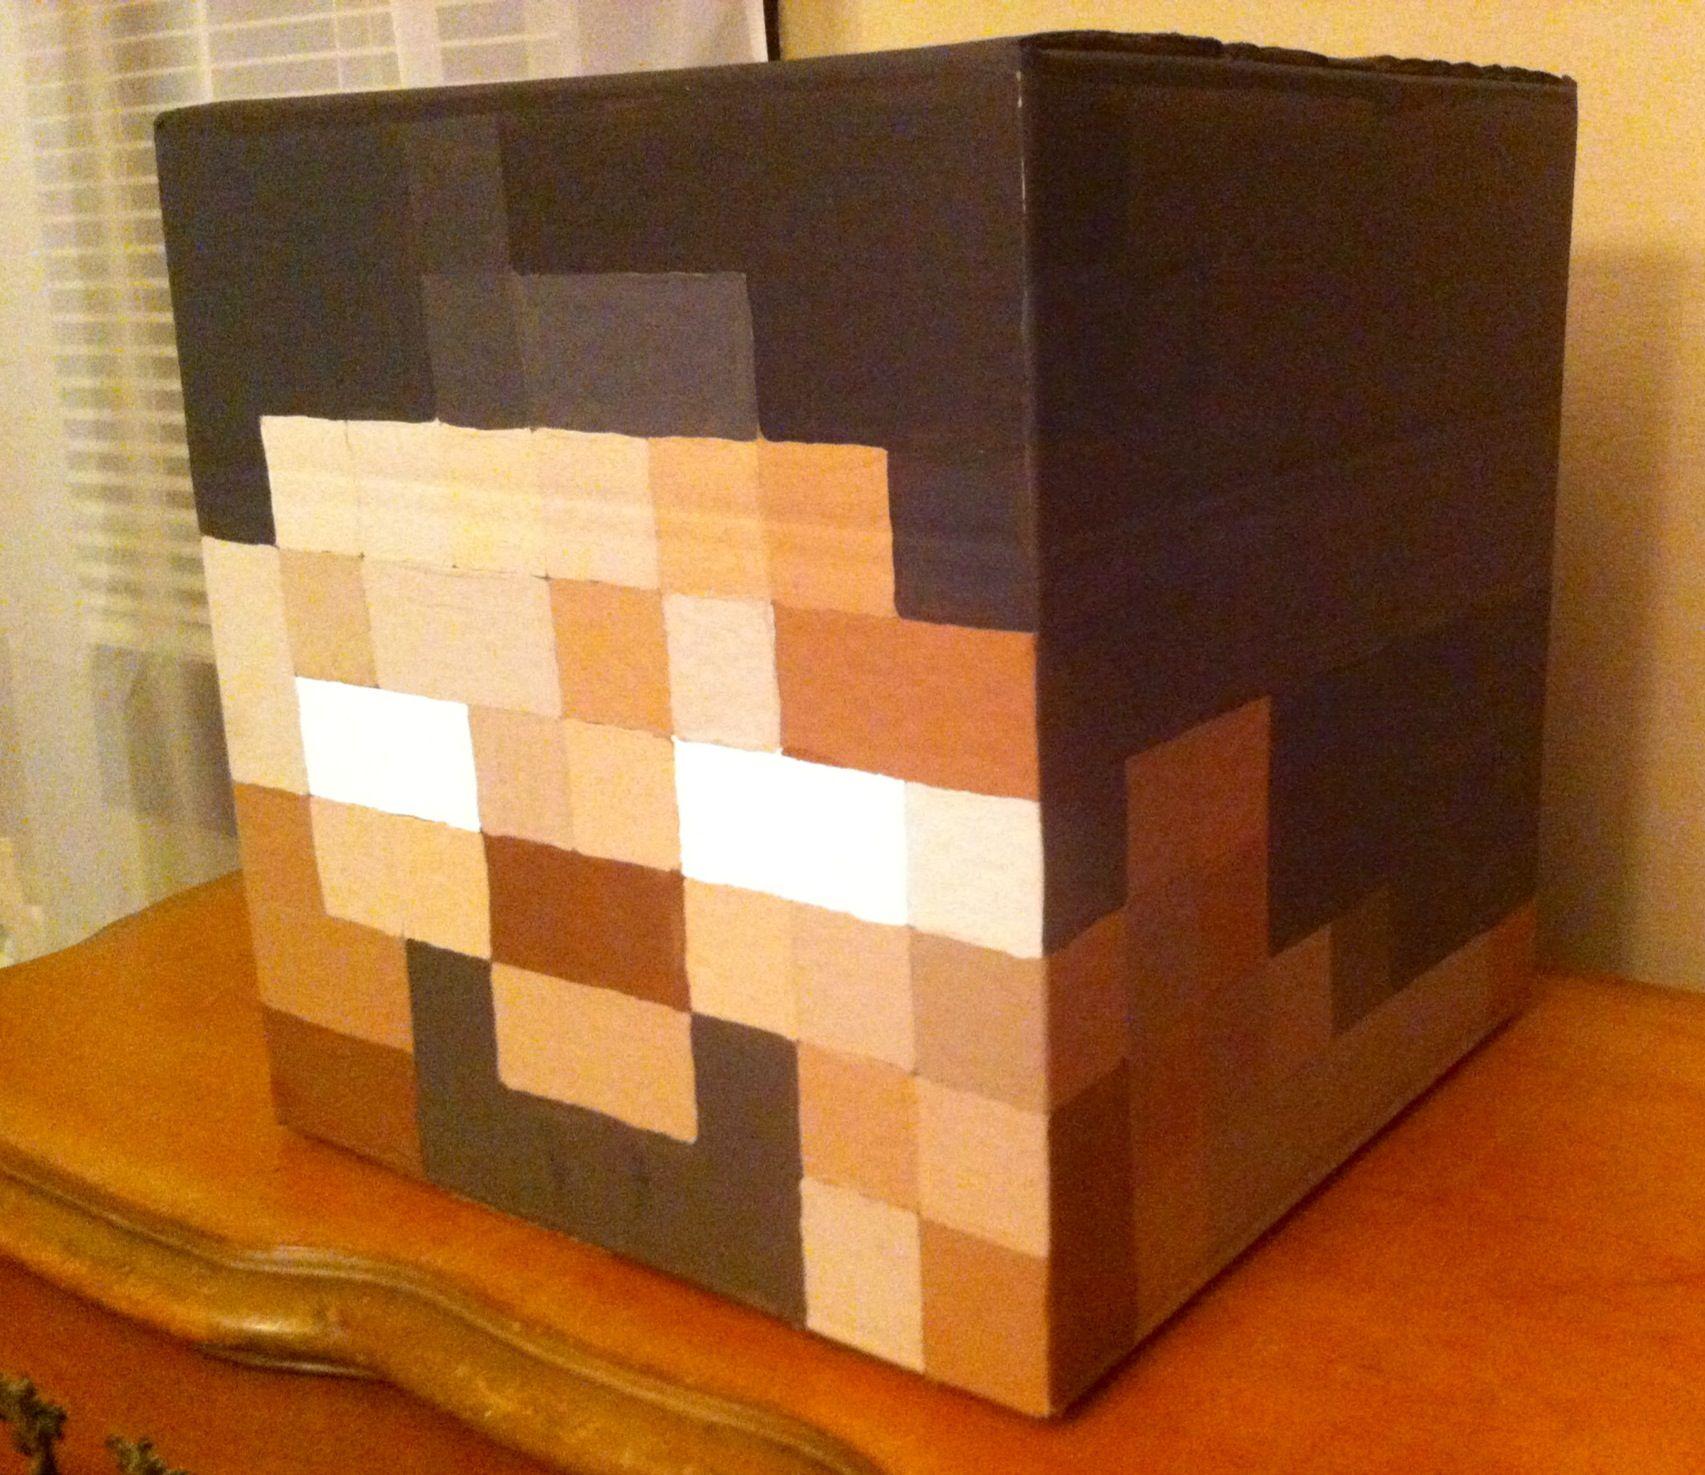 """Herobrine"" head Minecraft costume 12"" square box ..."